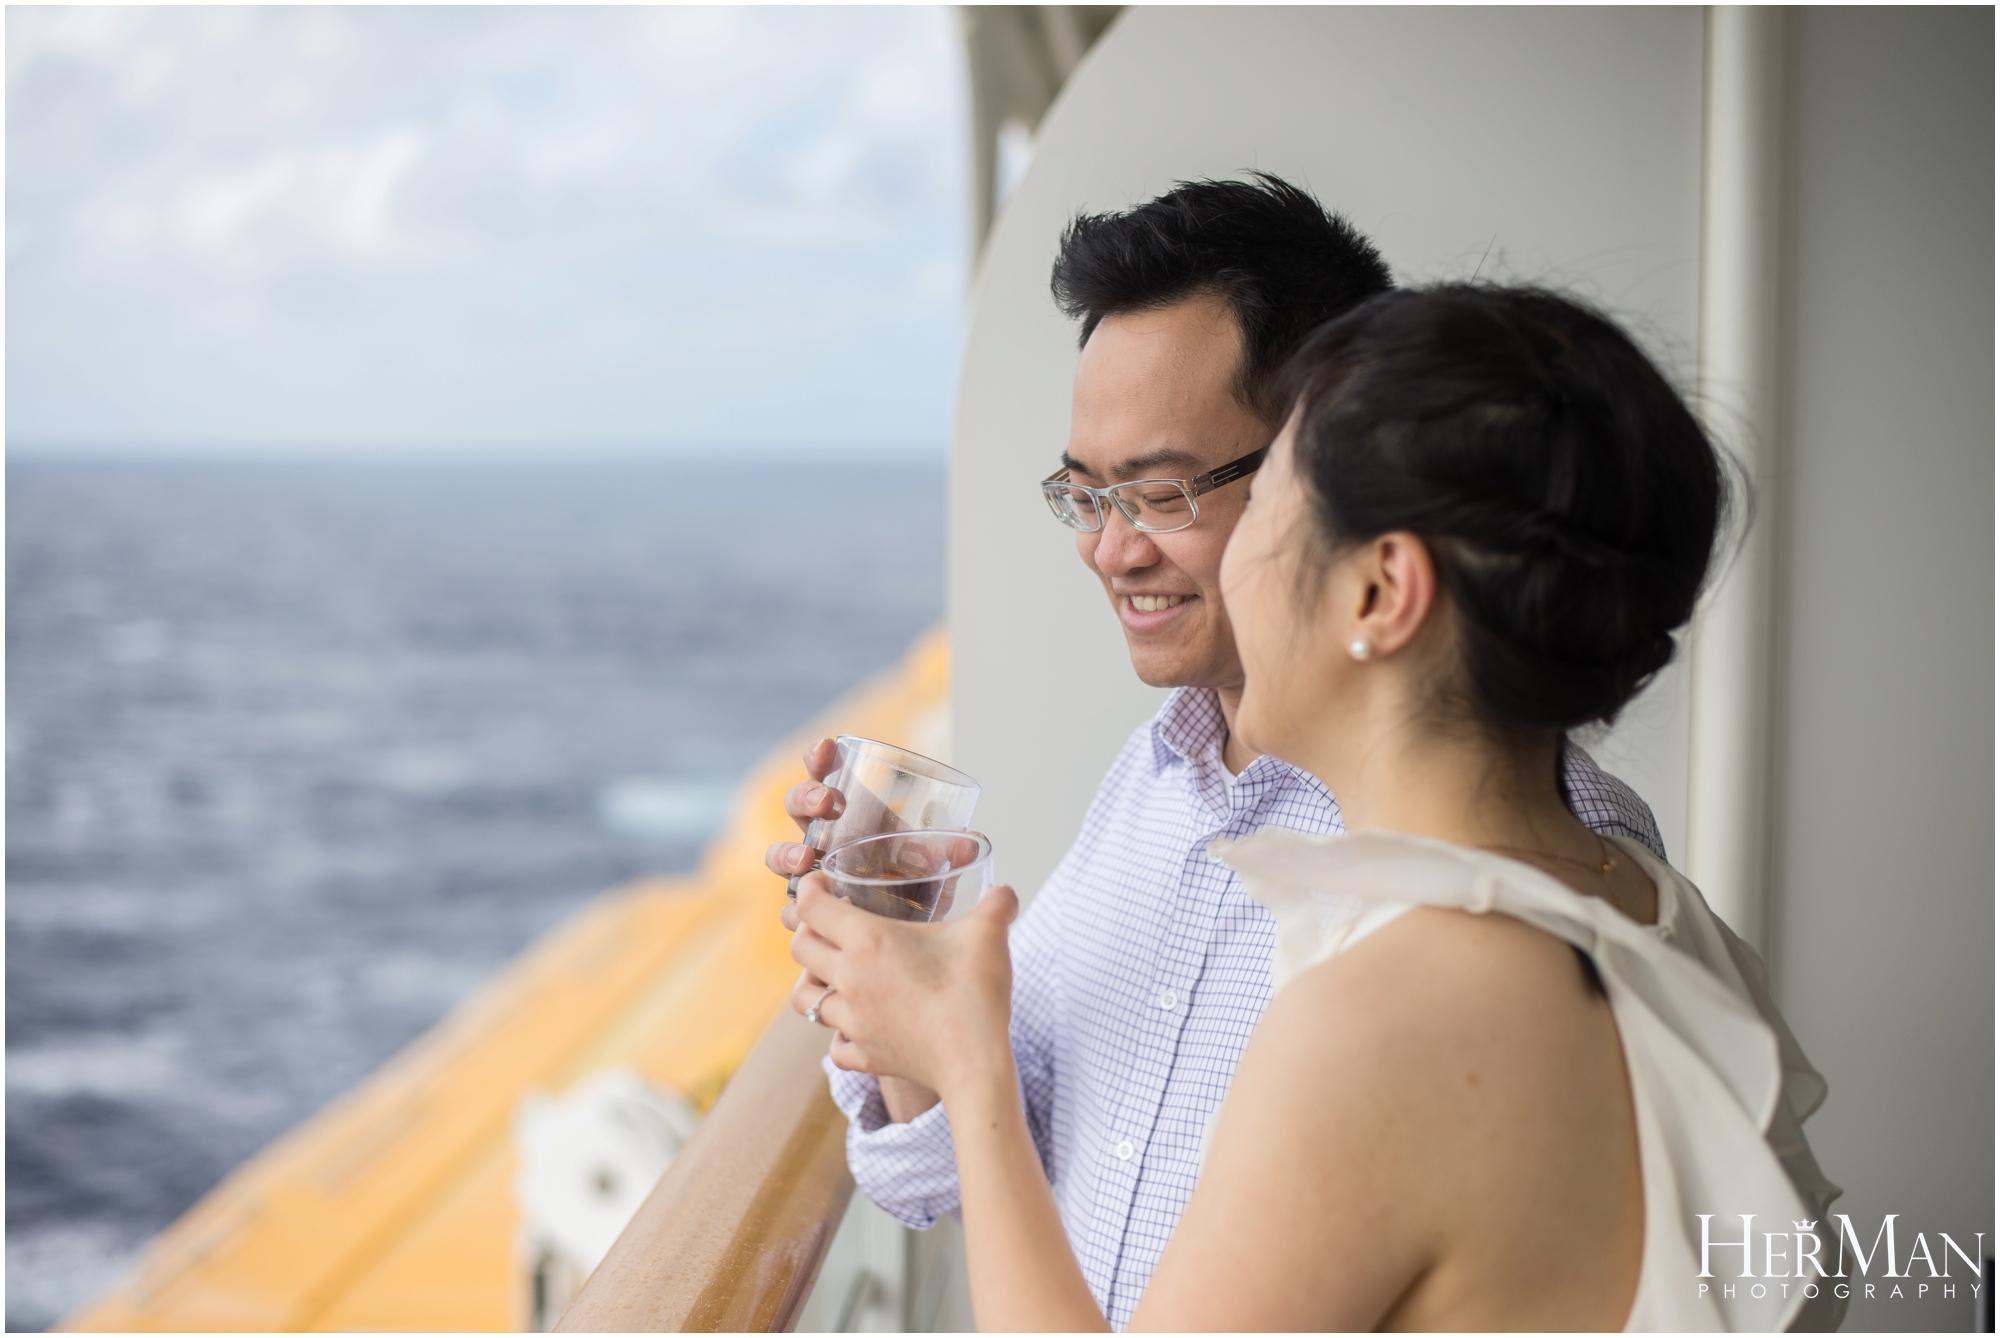 disney-fantasy-cruise-wedding-HerMan-photography_0006.jpg